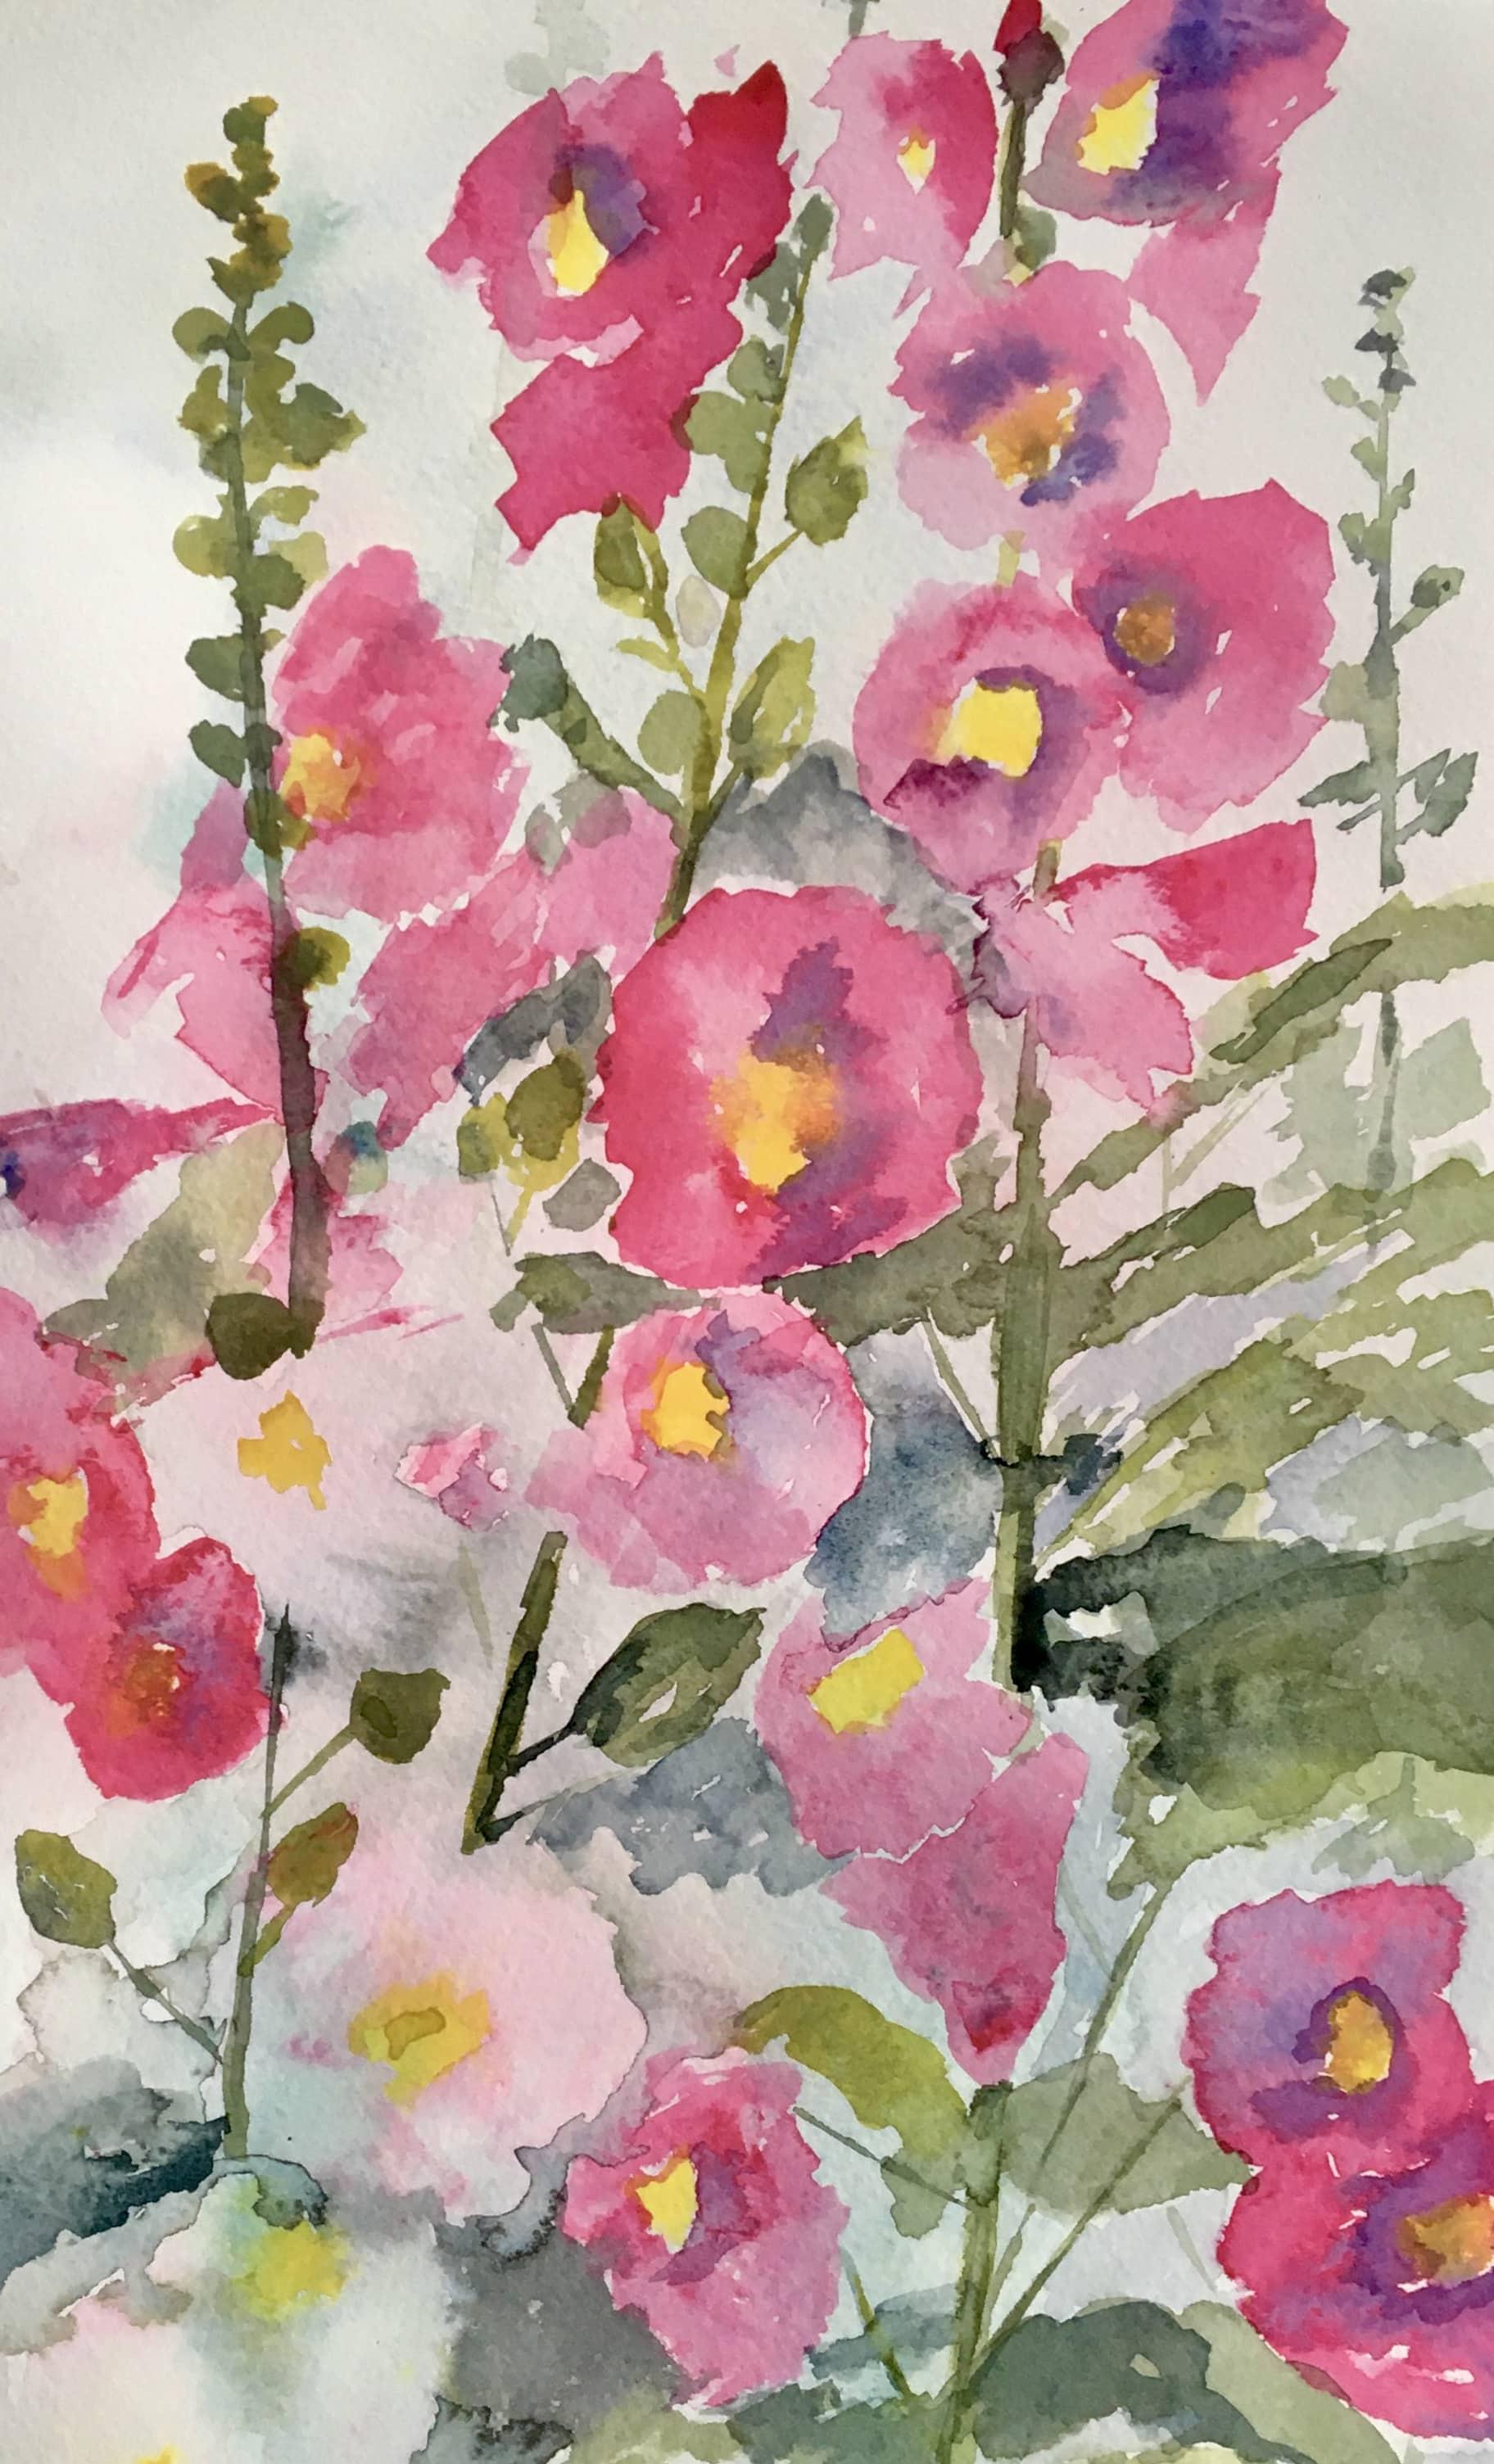 Watercolour of hollyhocks pink flowers